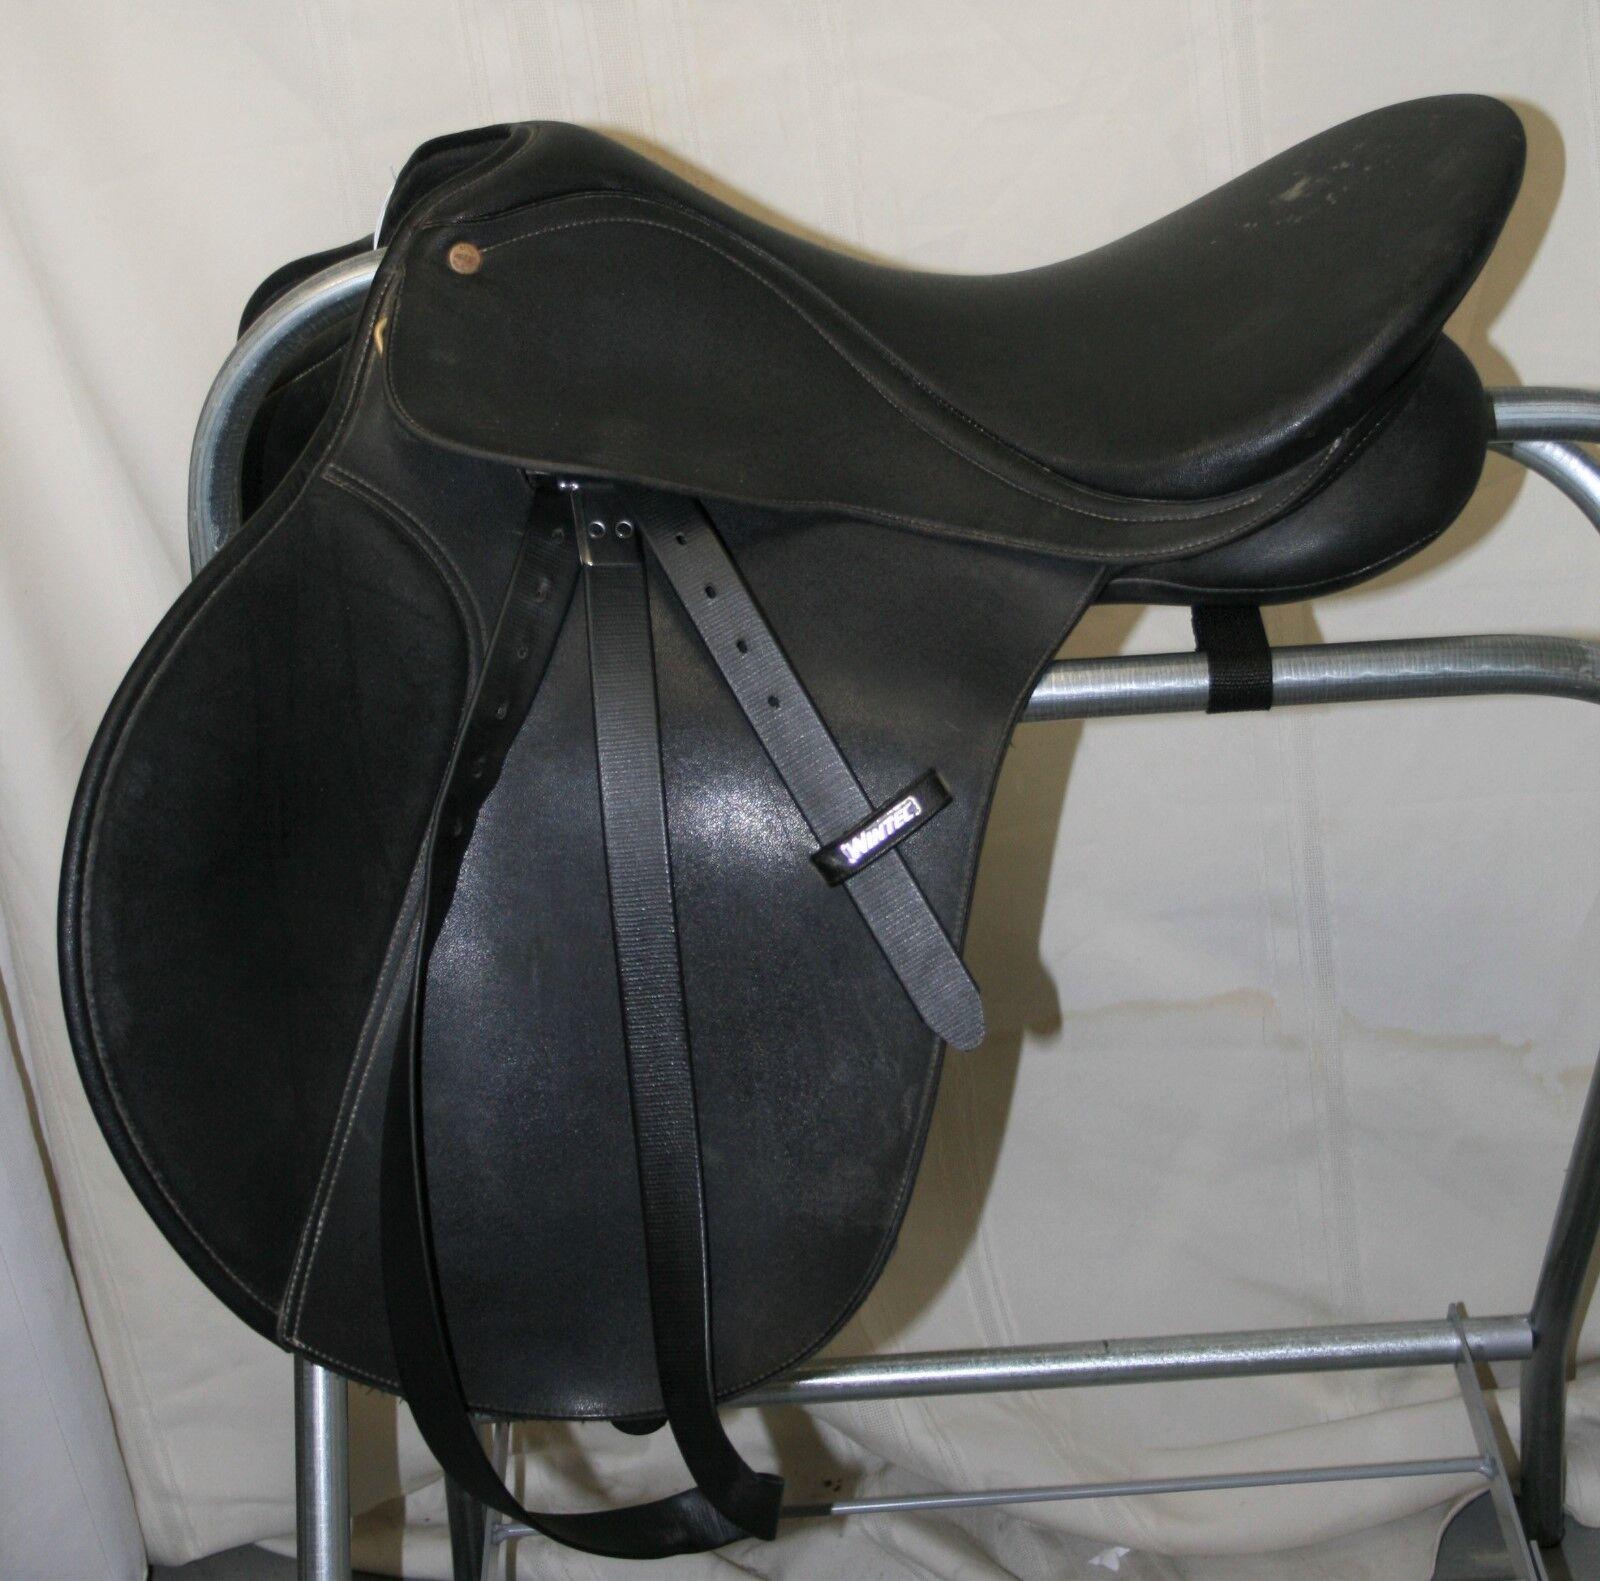 USED Wintec Bates All Purpose English Saddle with Wintec leathers - 16 1 2  seat